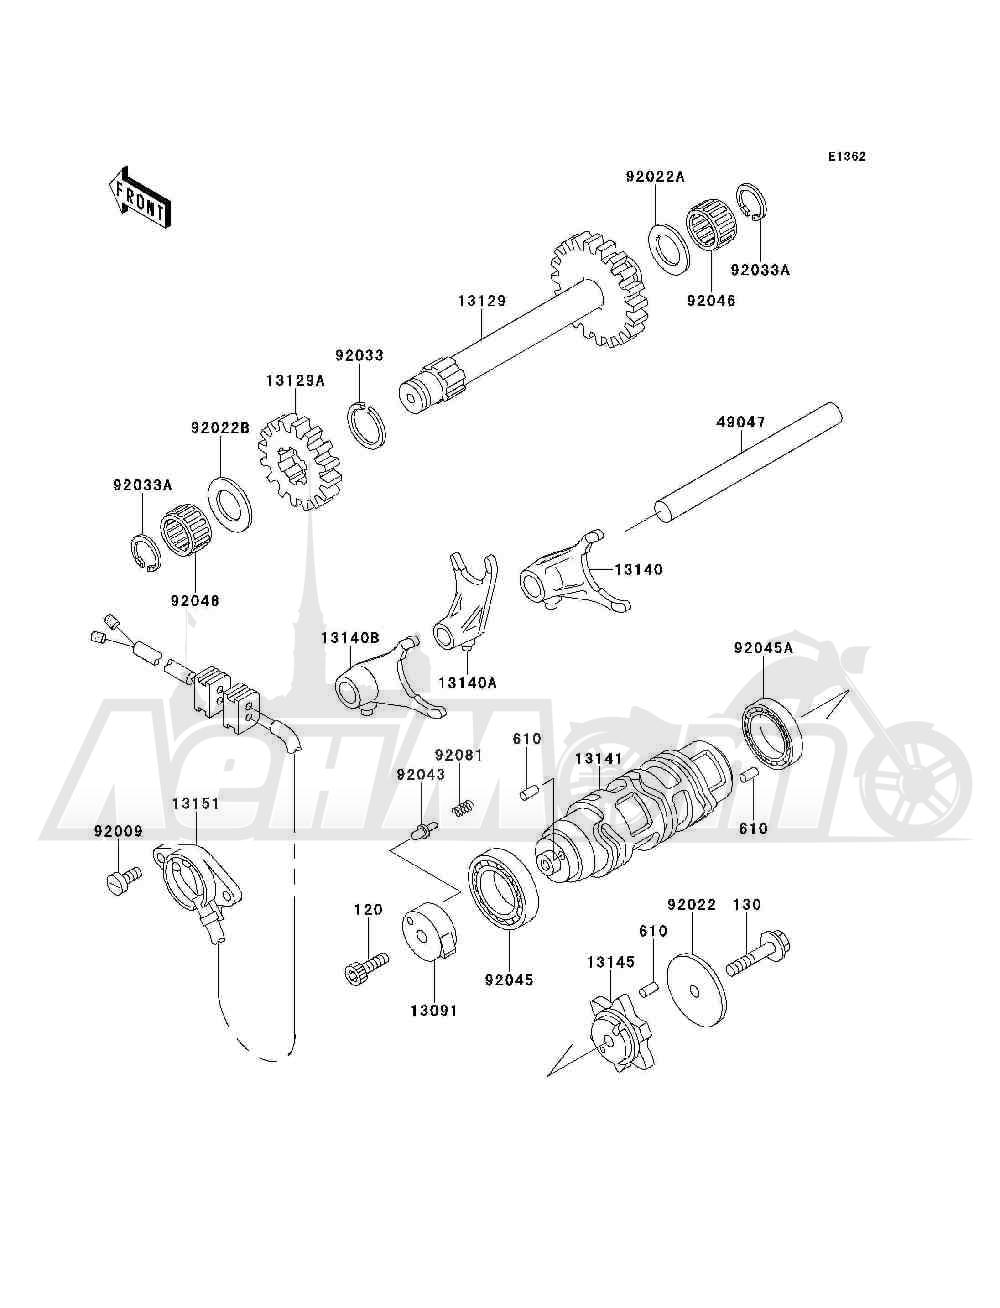 Запчасти для Квадроцикла Kawasaki 1994 BAYOU 300 4X4 (KLF300-C6) Раздел: GEAR CHANGE DRUM / SHIFT FORK(S) | переключение передач барабан/вилка переключения (S)